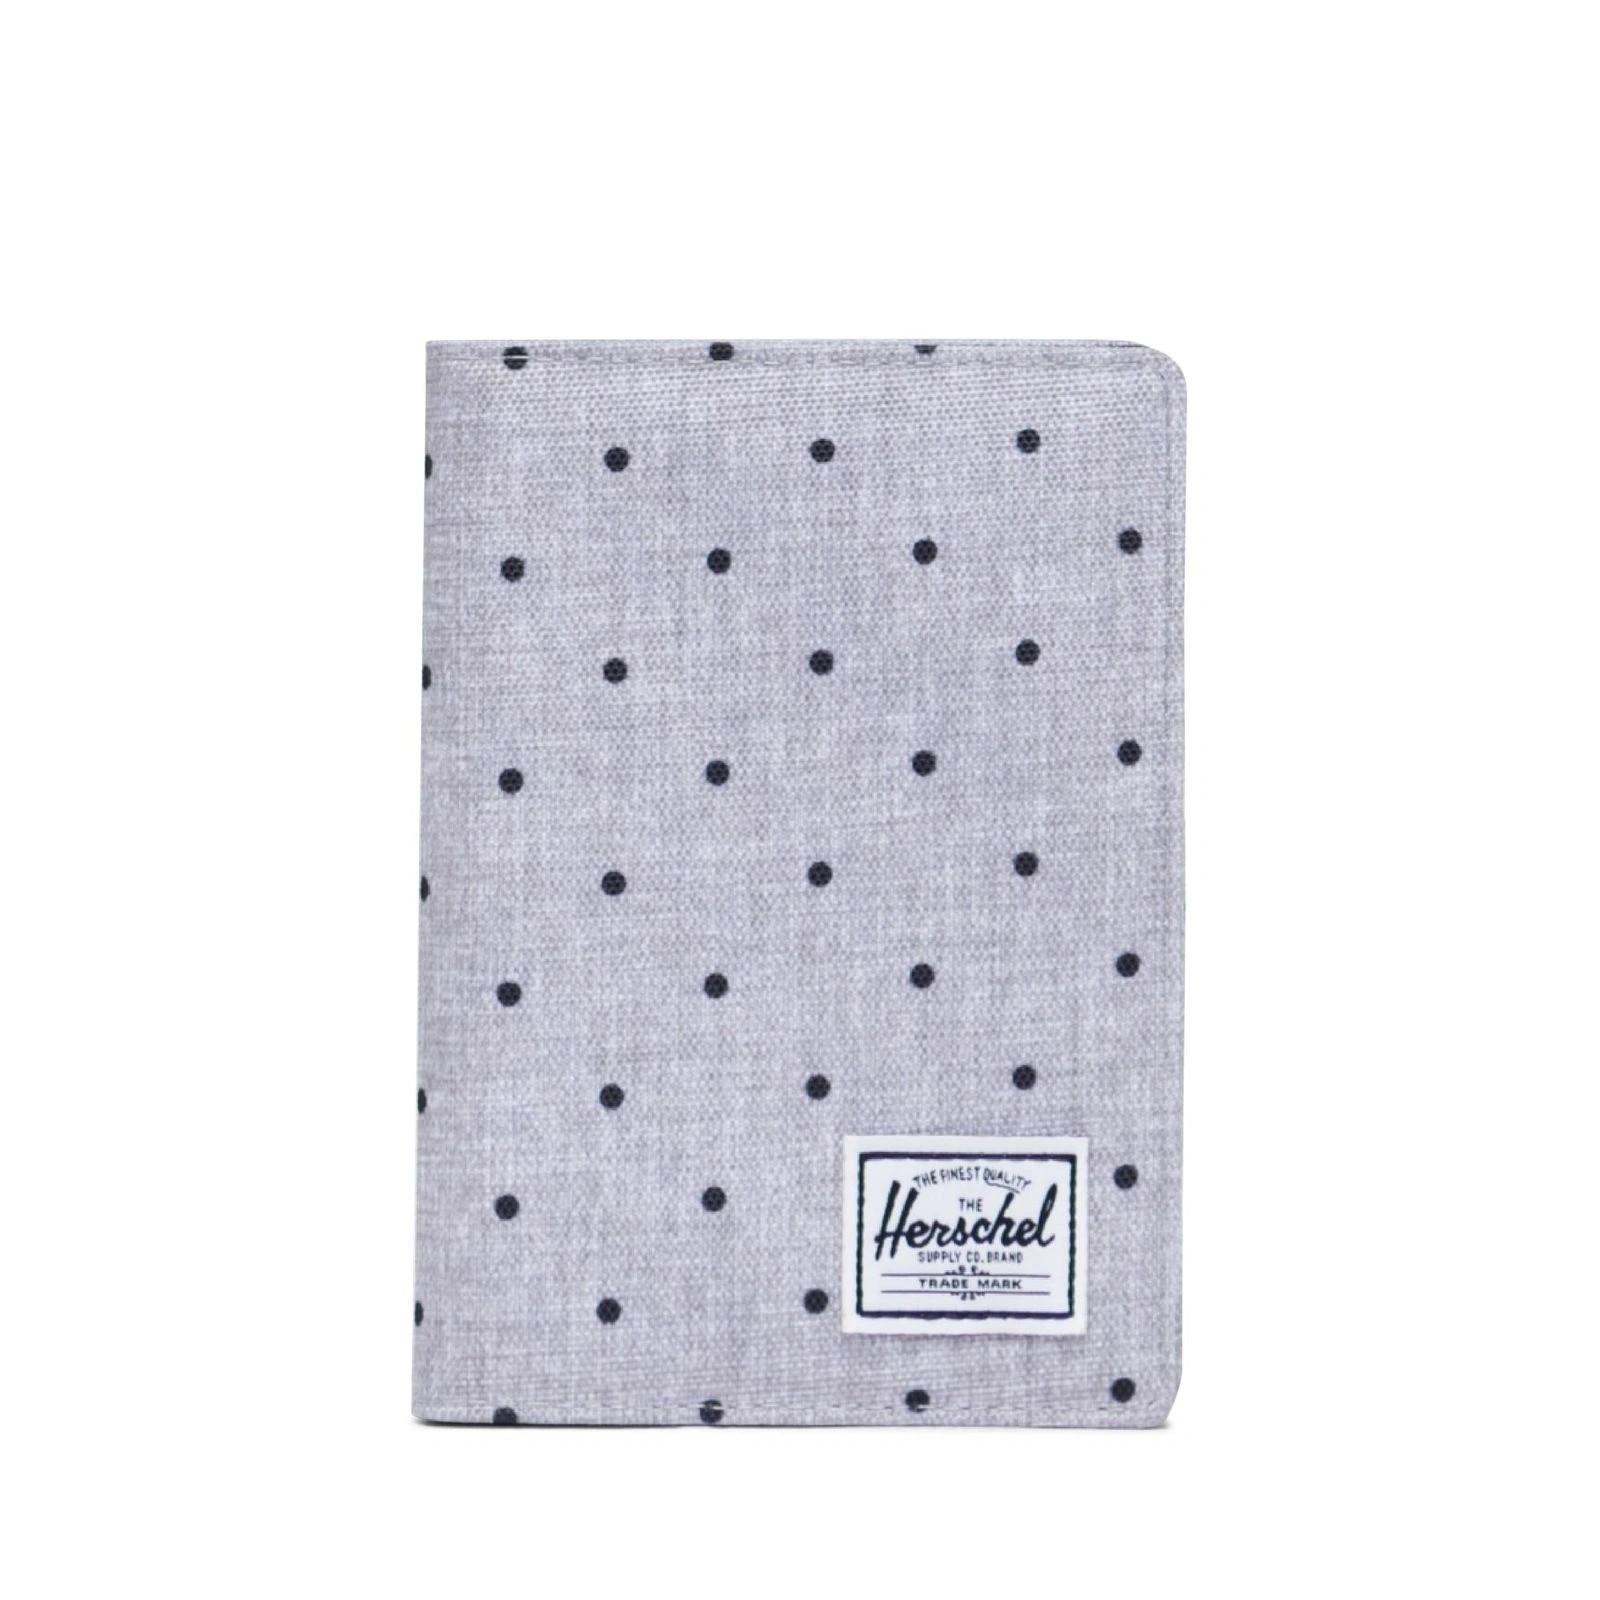 Herschel Raynor Passport Holder RFID Polka Dot Crosshatch Grey/Black